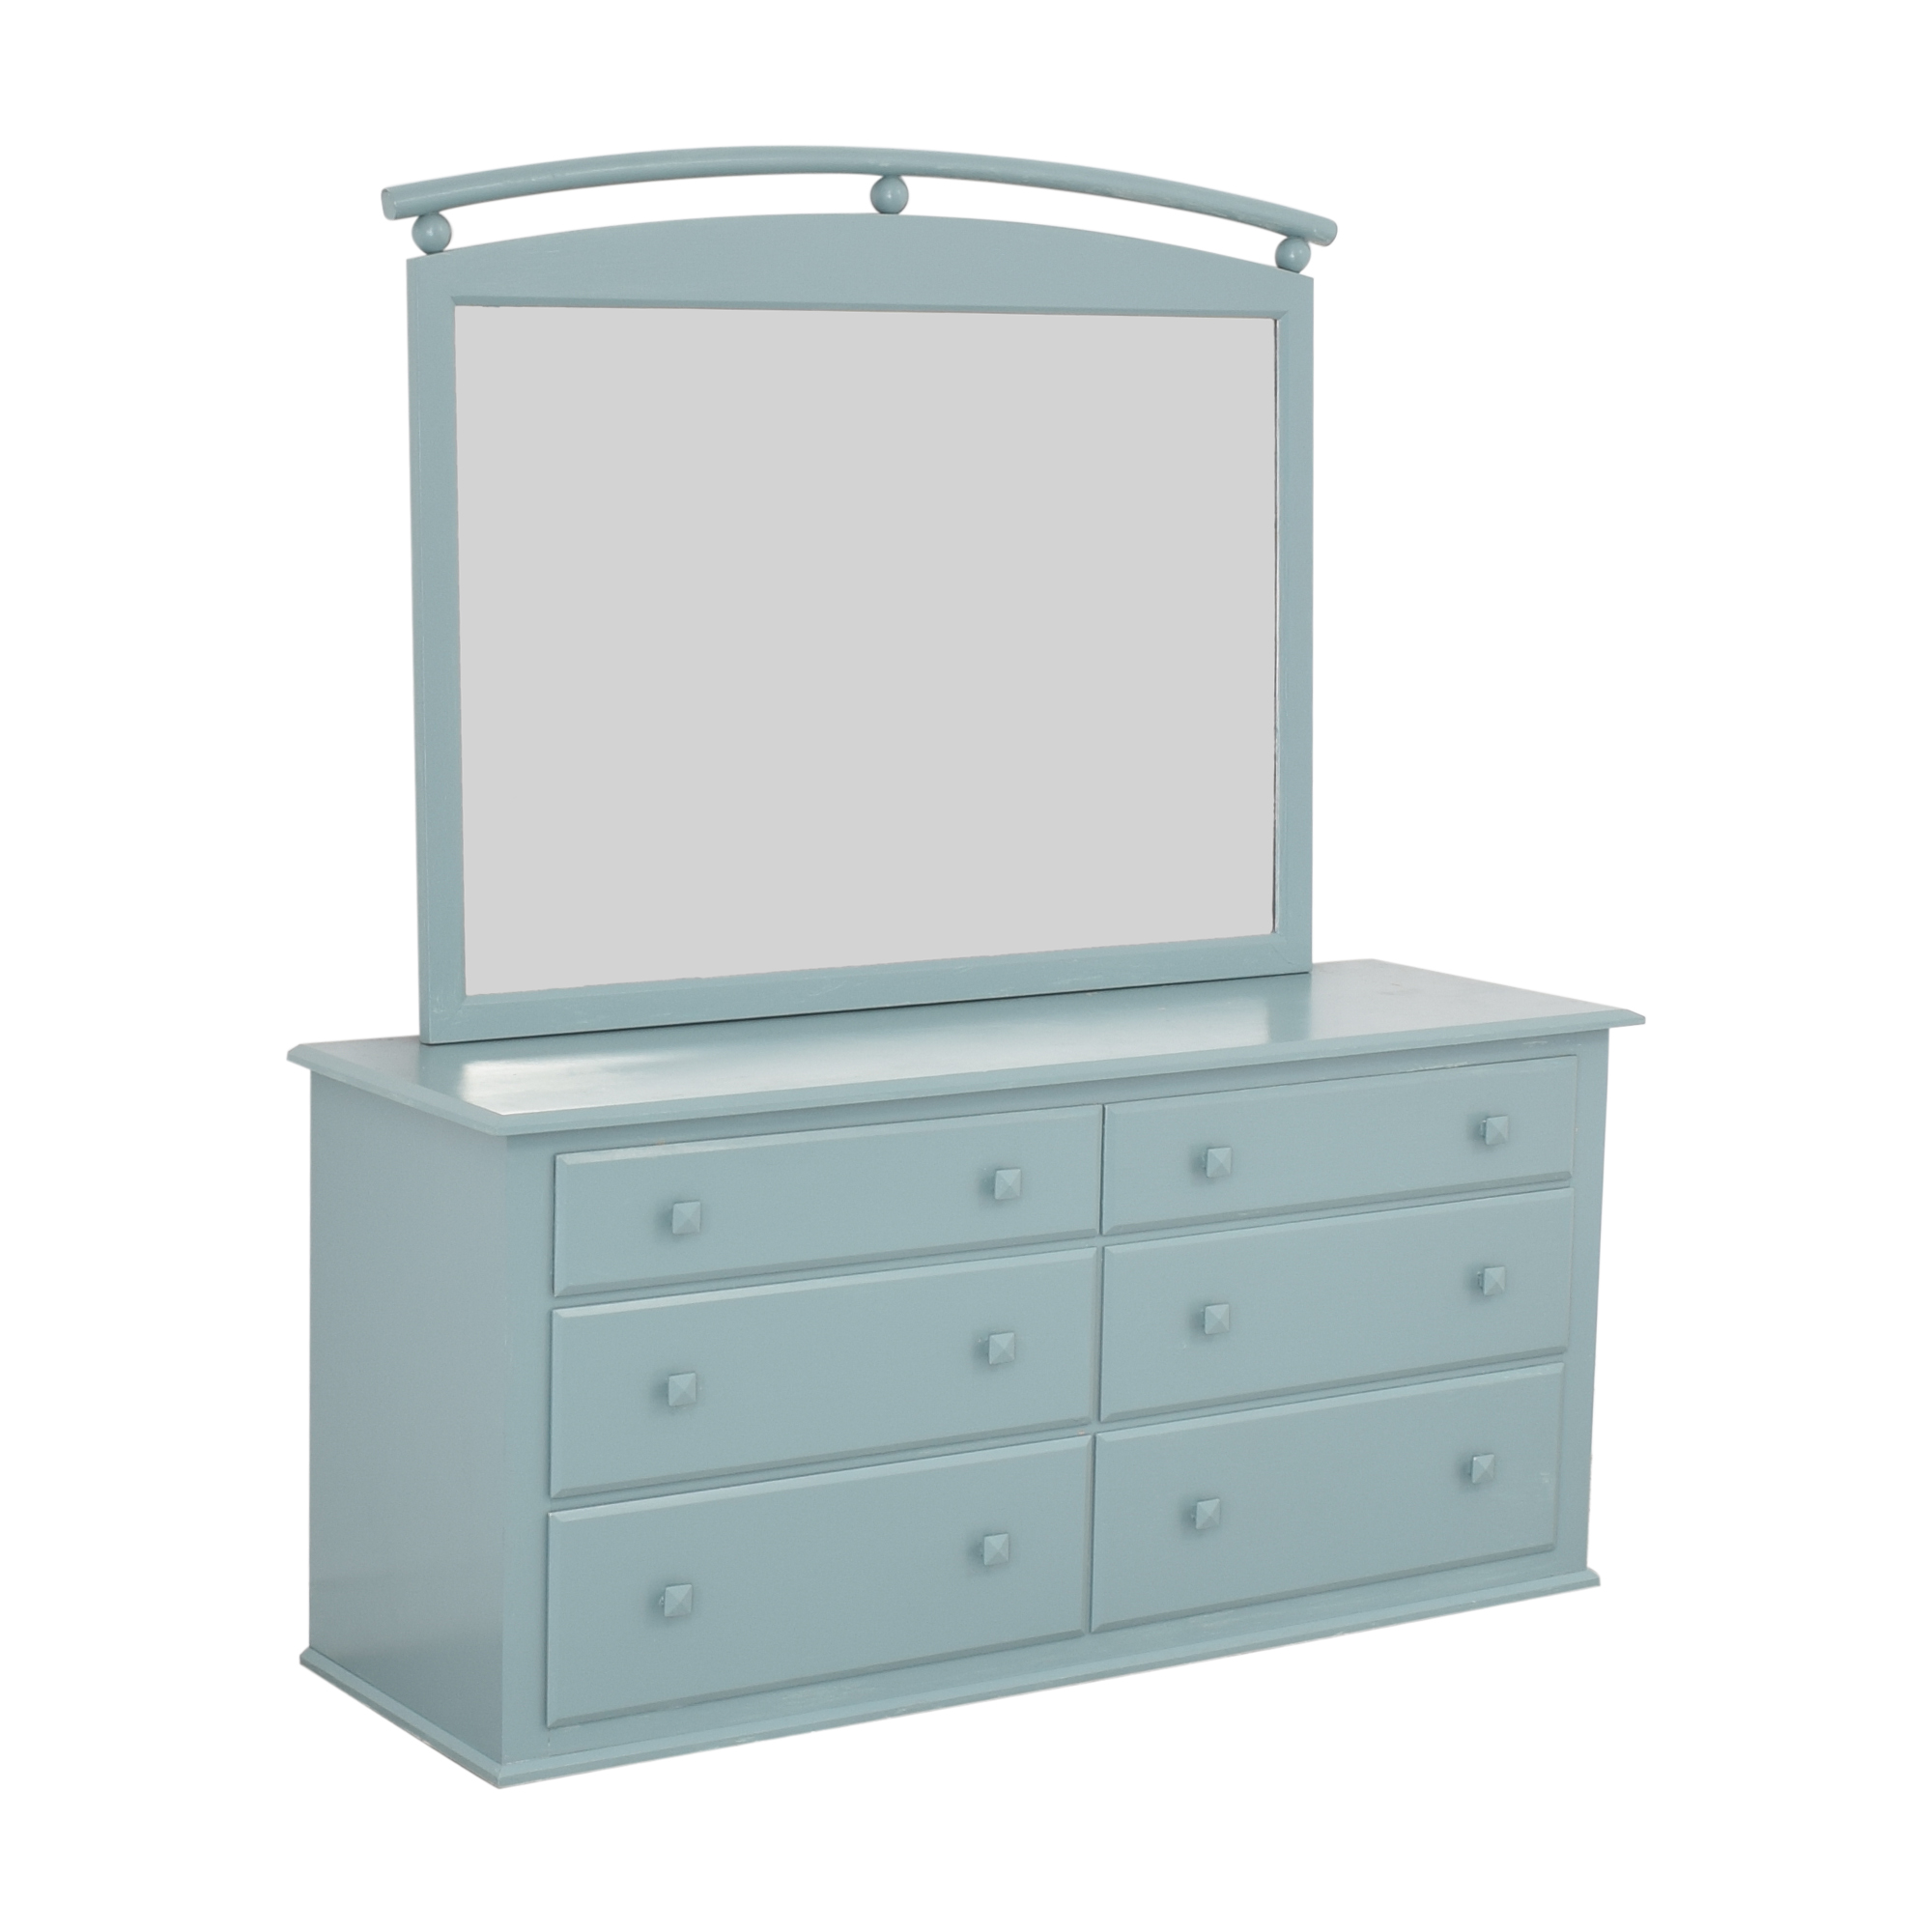 Ethan Allen Ethan Allen American Dimensions Dresser with Mirror nj